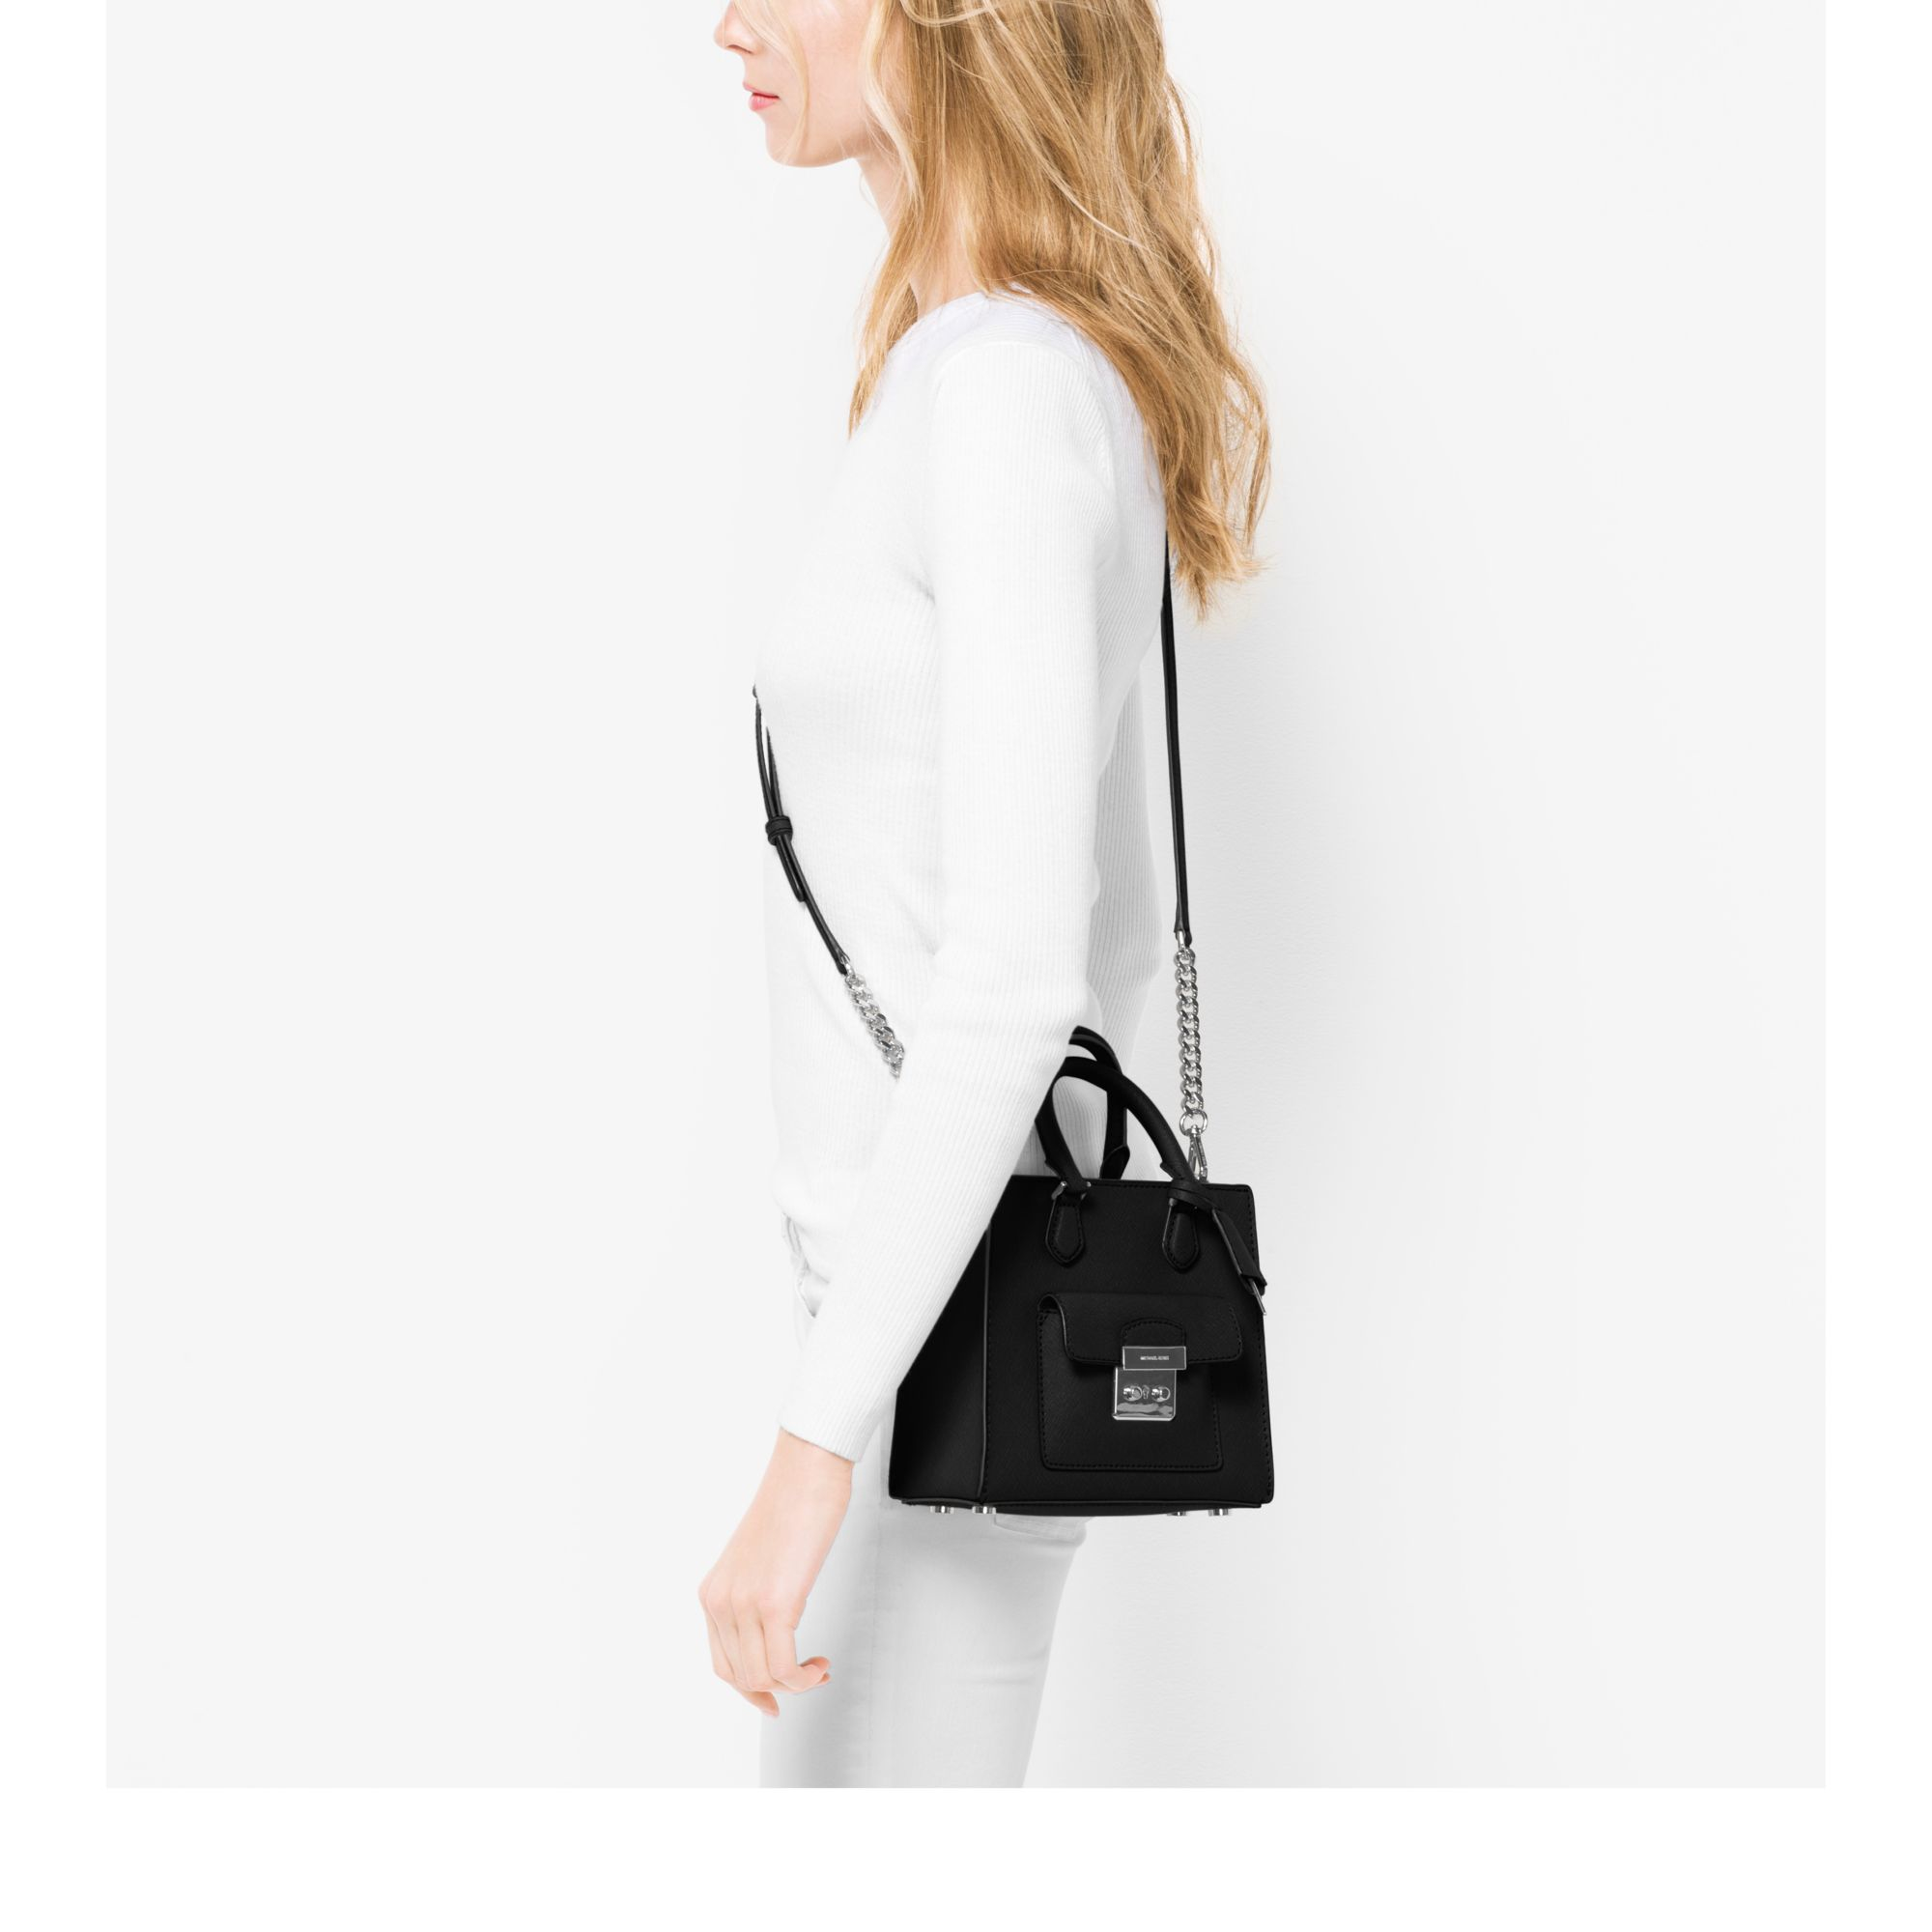 6be9ae58b186 Michael Kors Bridgette Small Saffiano Leather Crossbody Bag in Black ...